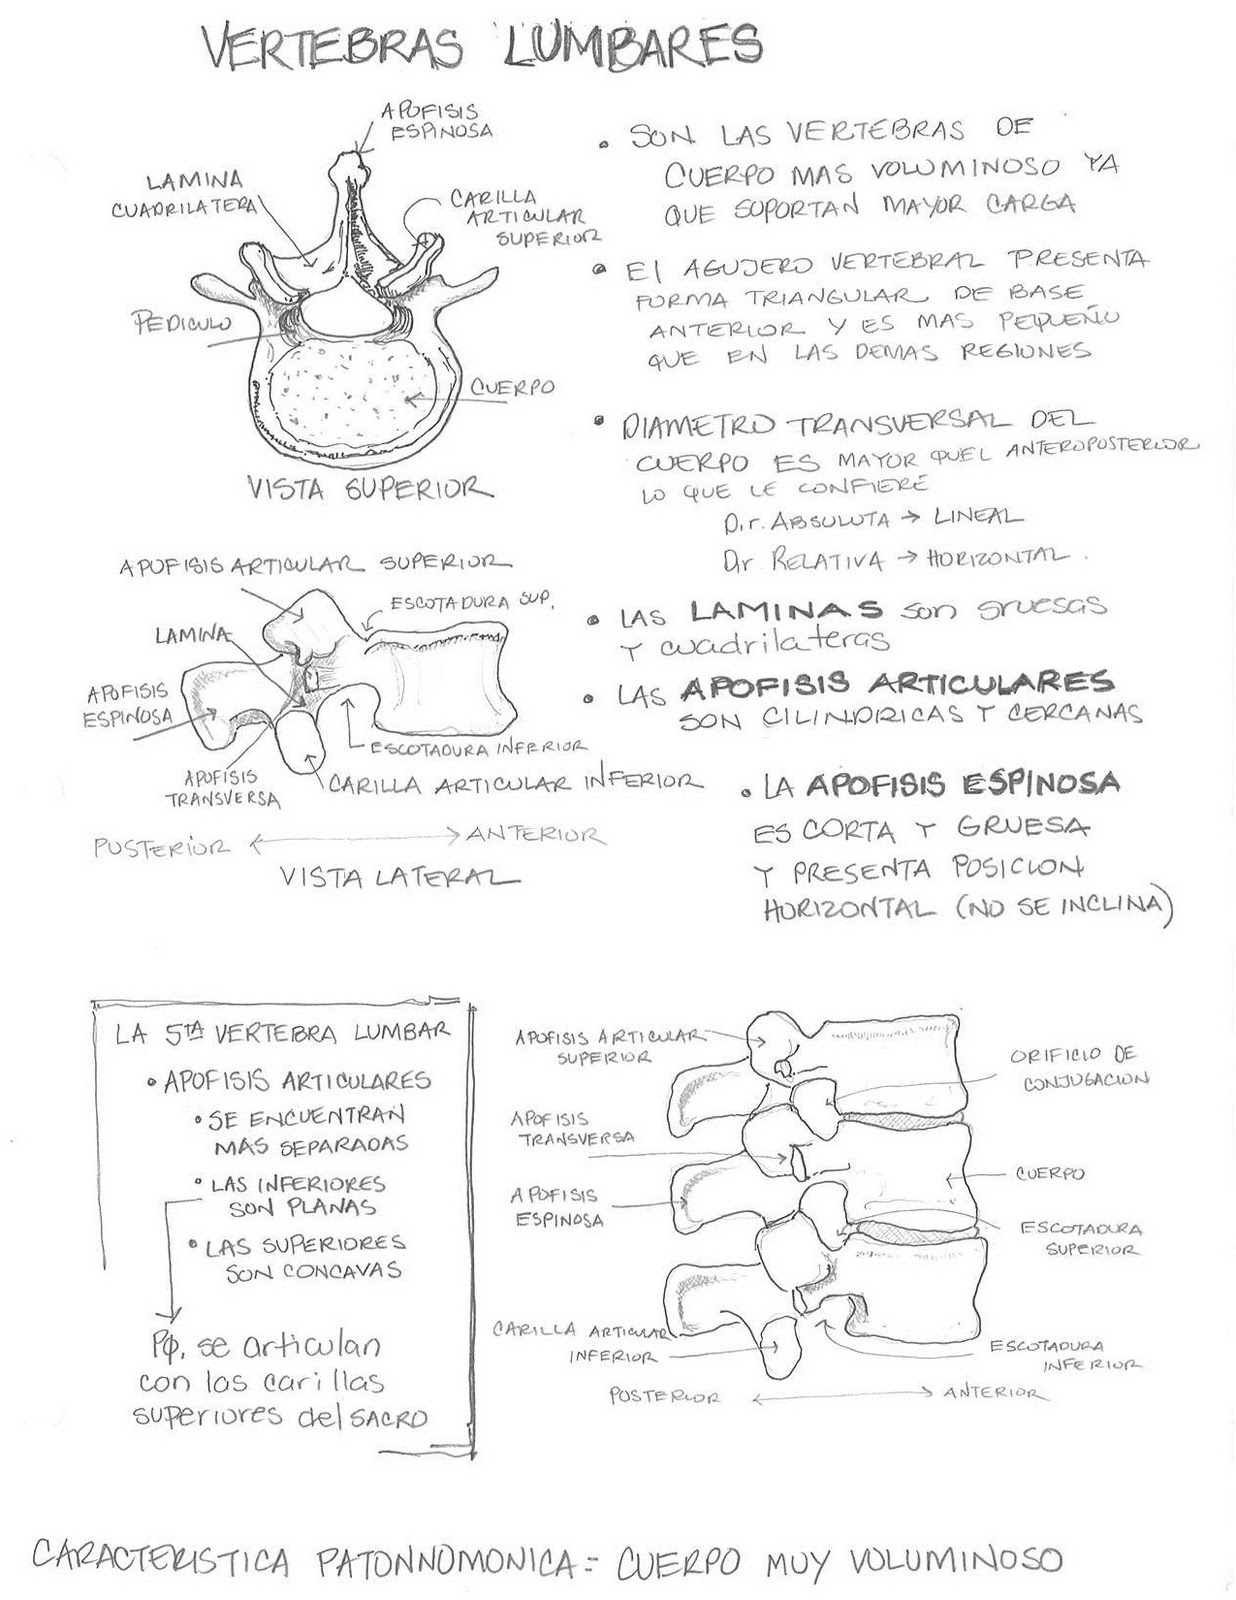 Anatomía Humana... Para Humanos: Sistema Oseo - Vértebras Lumbares